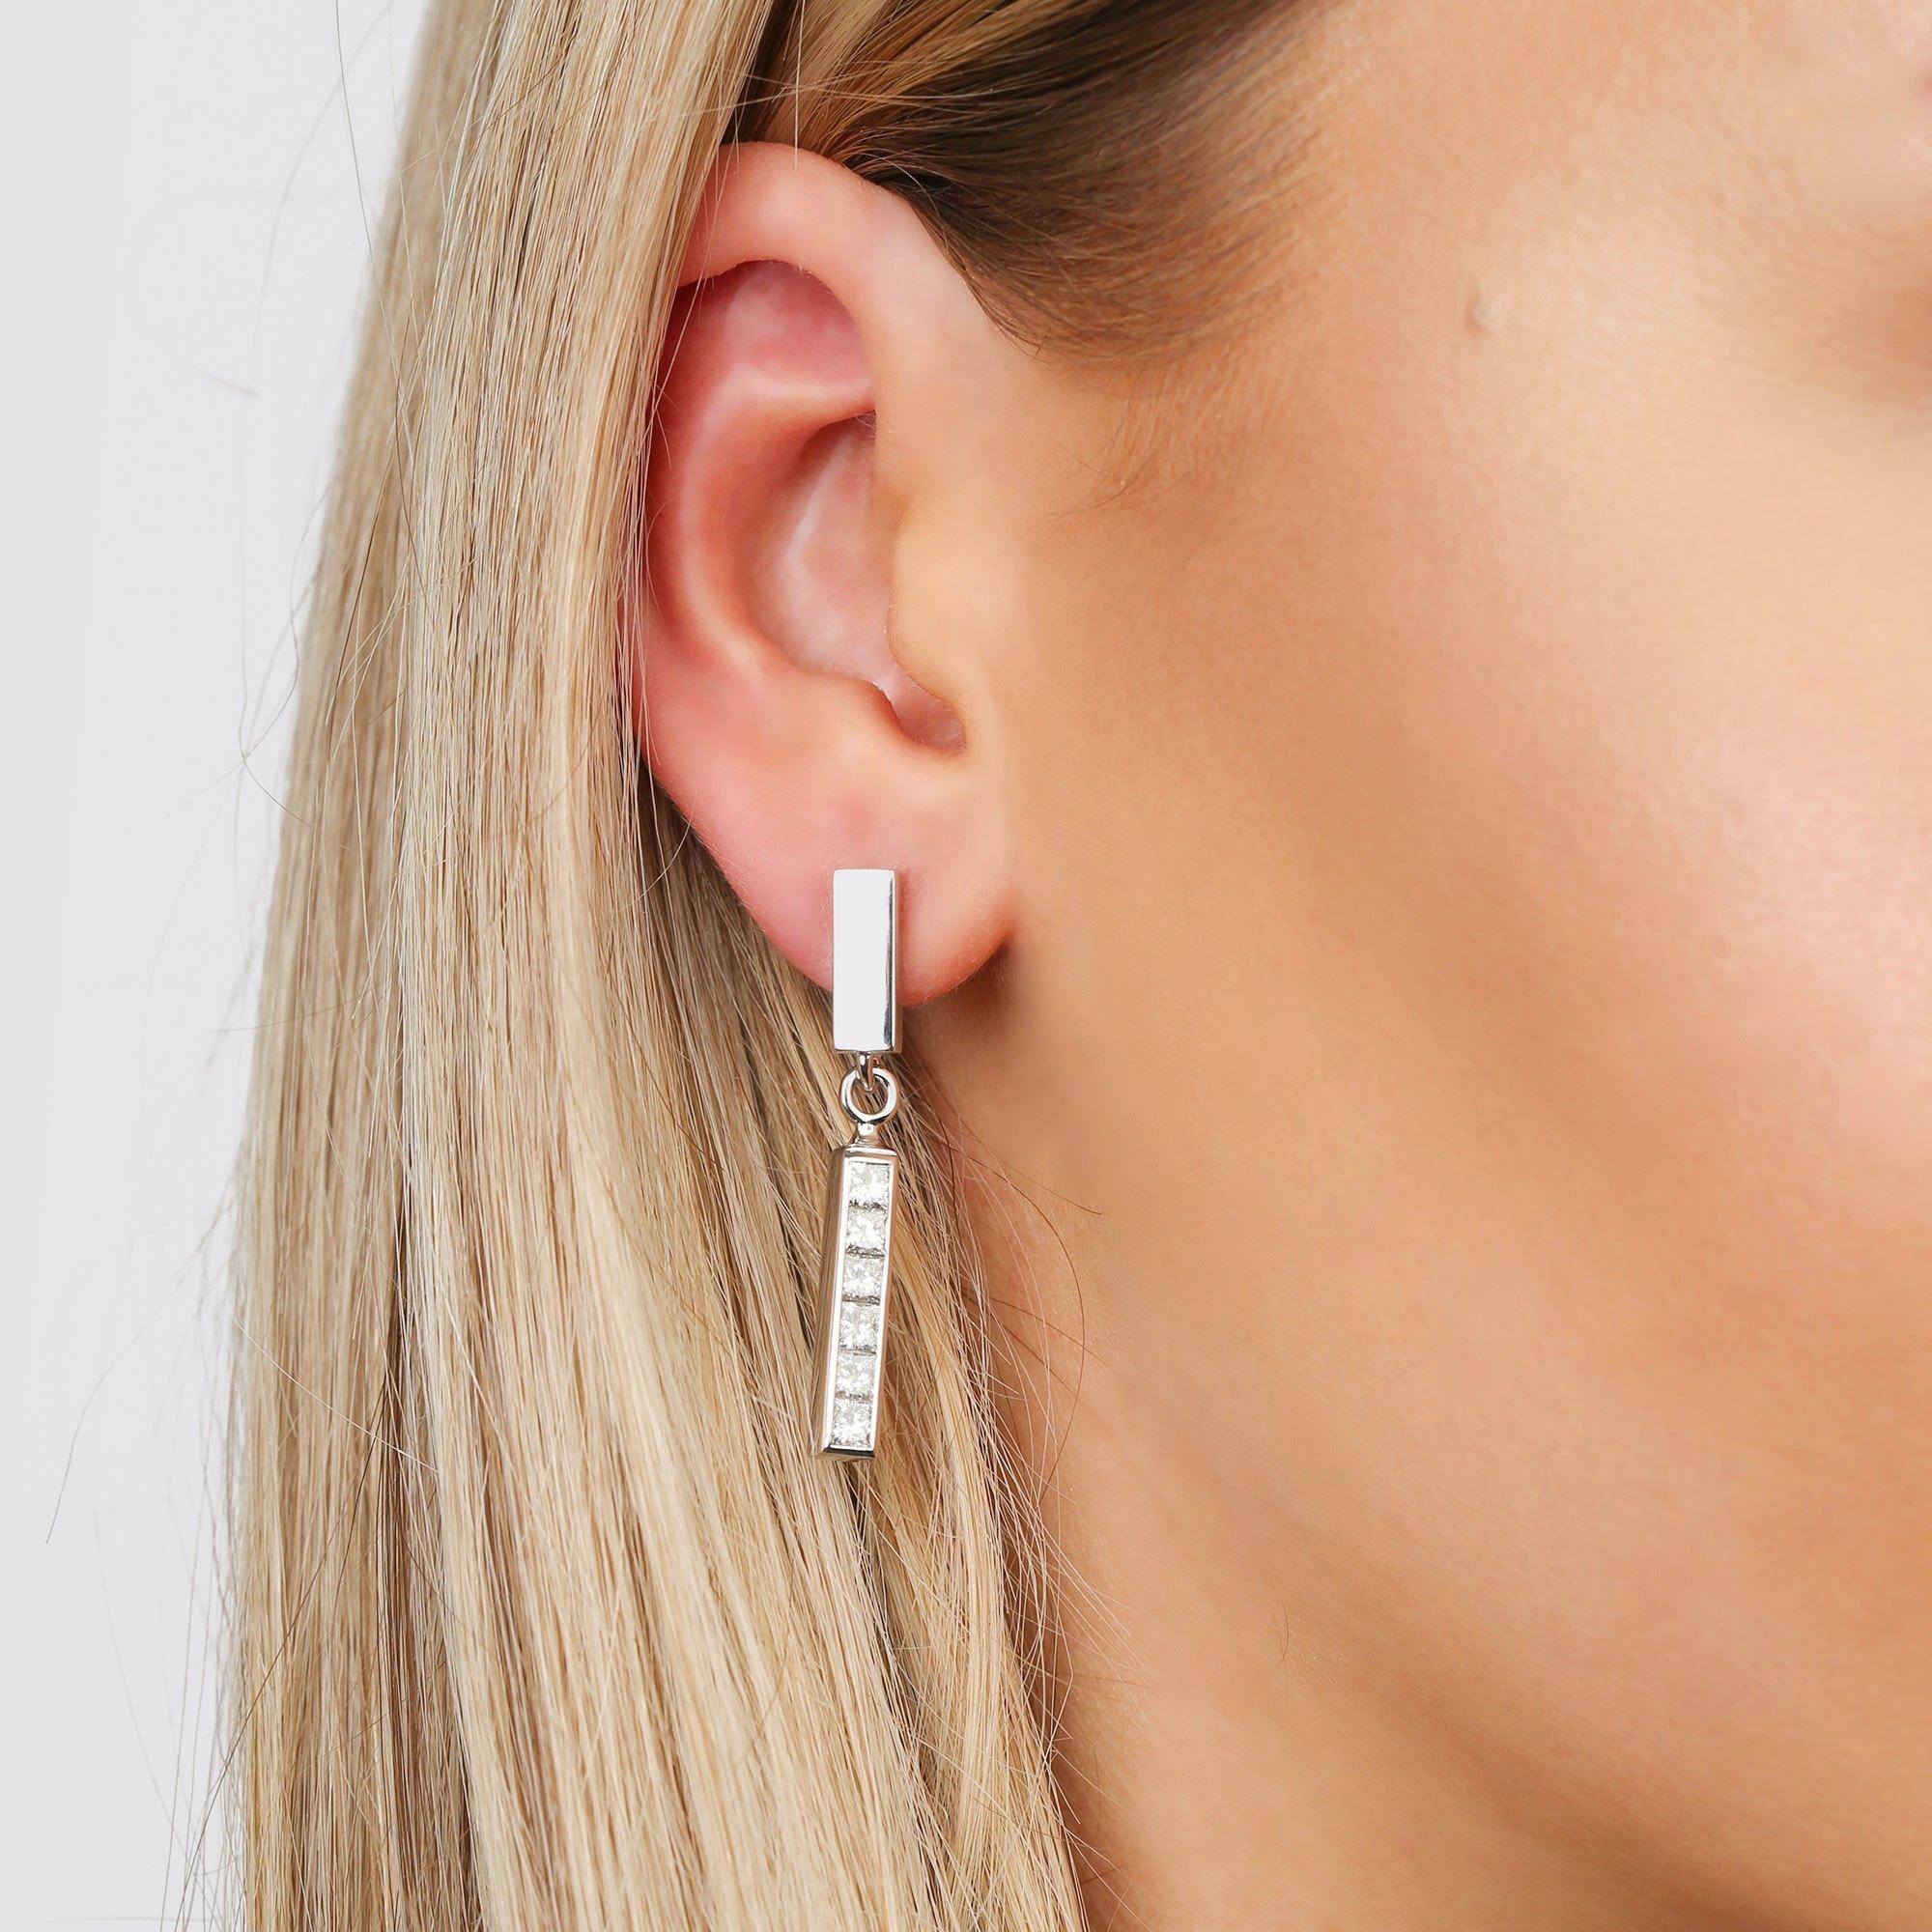 Theo Fennell Strip Princess Cut Diamond Interchangeable Earring Set